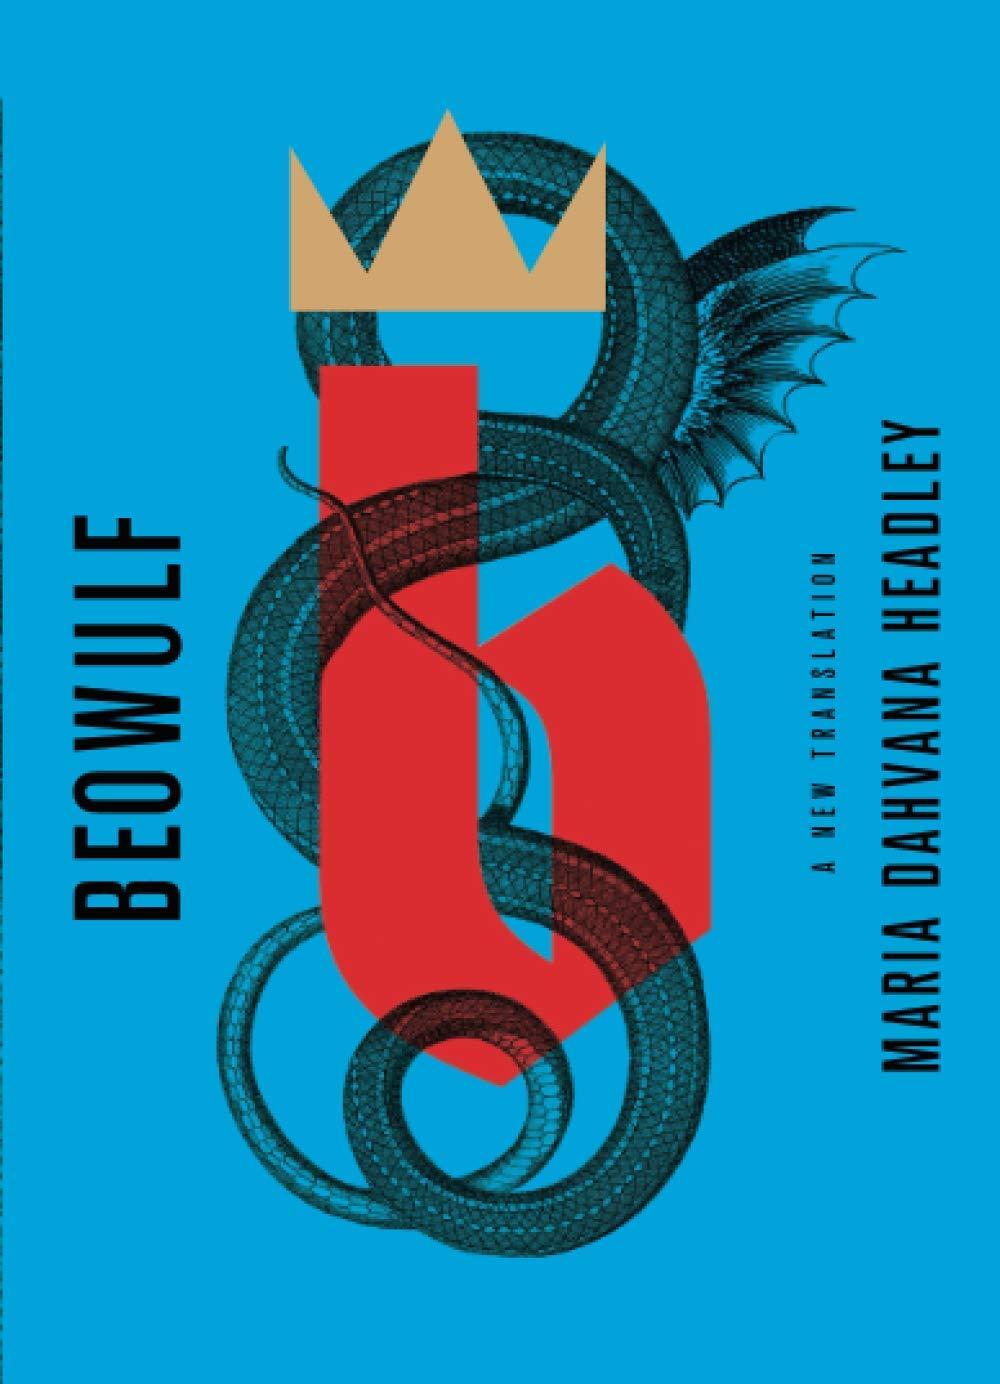 Beowulf: Amazon.es: Dahvana Headley, Maria, Dahvana Headley ...